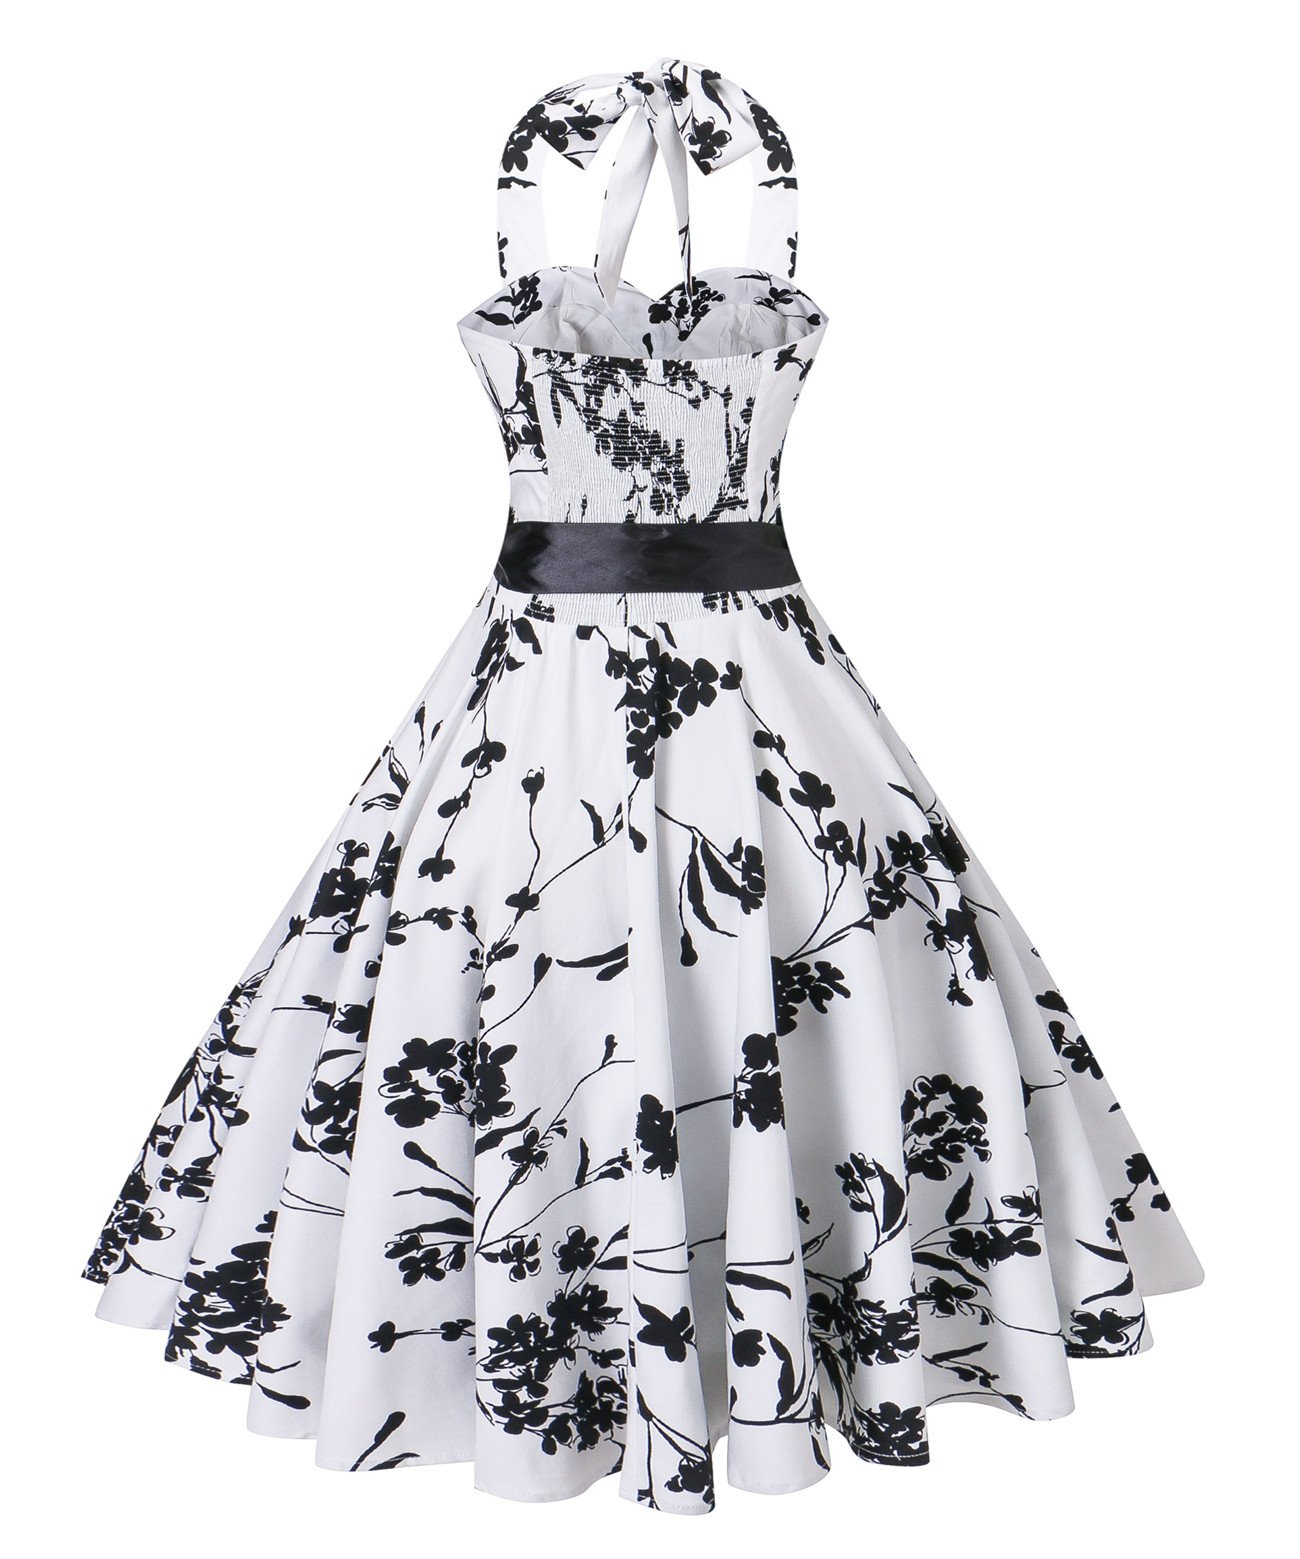 Dress Rockabilly A Hundred And One - Fashion